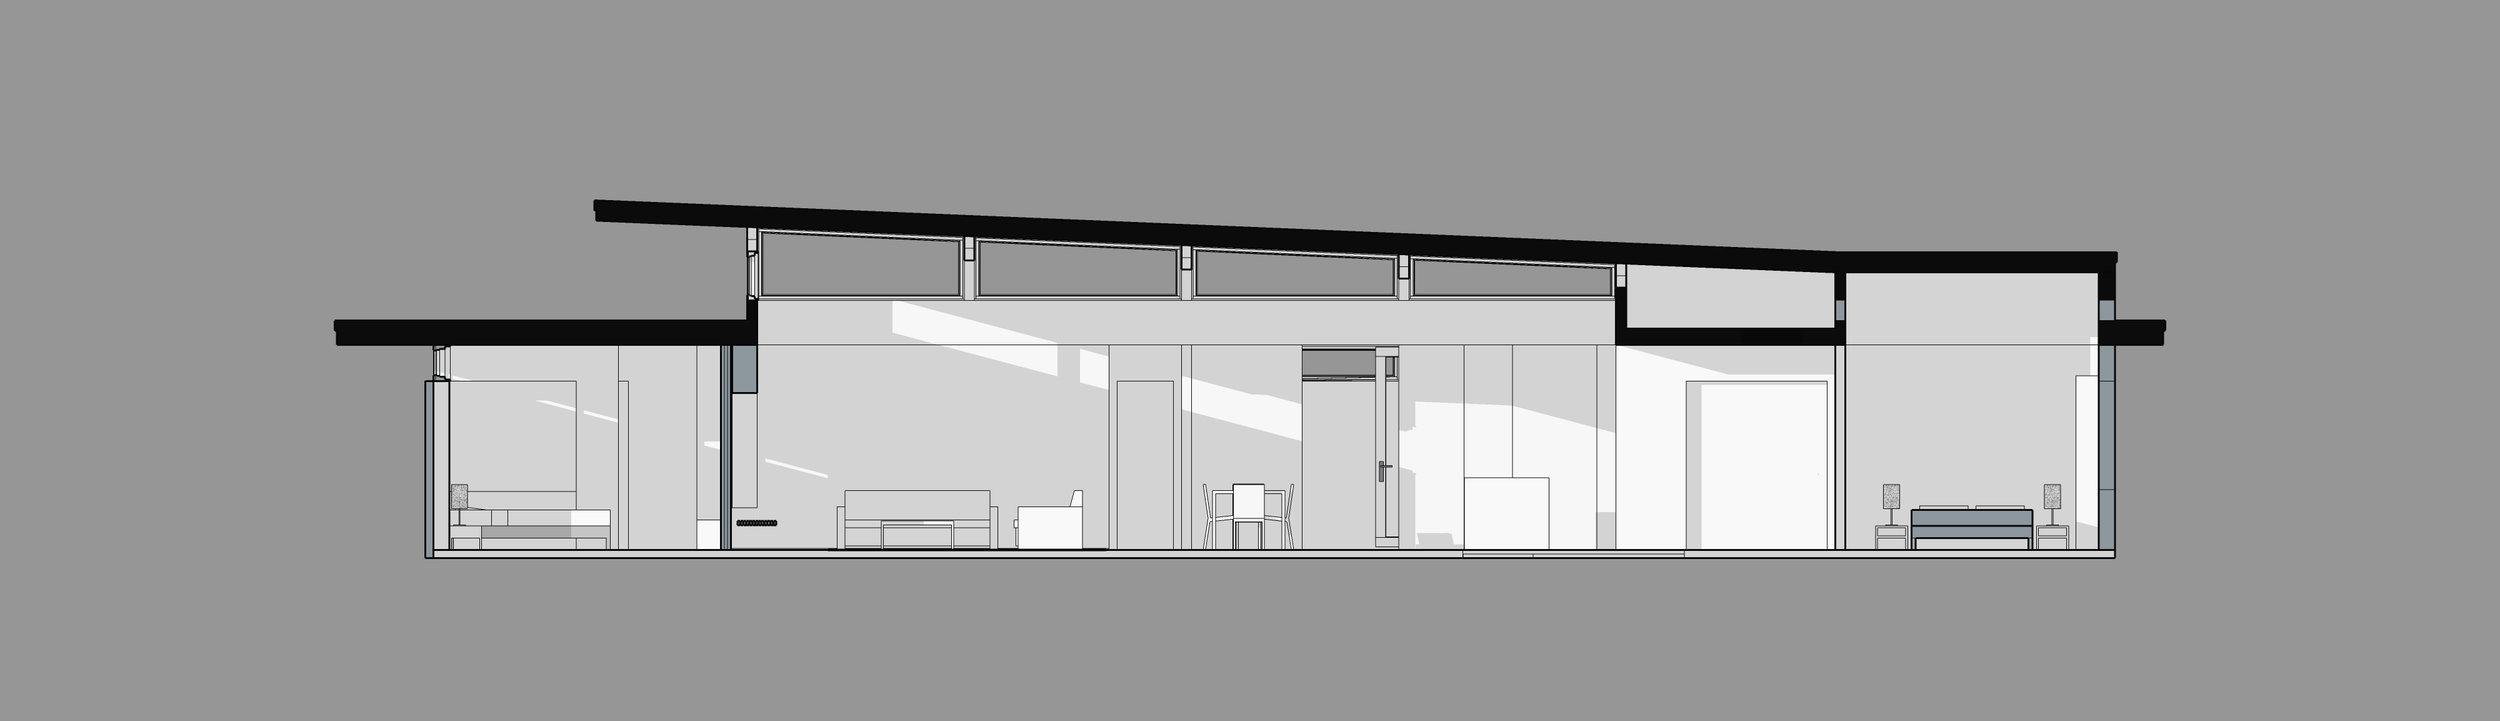 turkel_design_modern_prefab_home_axiomdeserthouse_schematic_design_sections.jpg